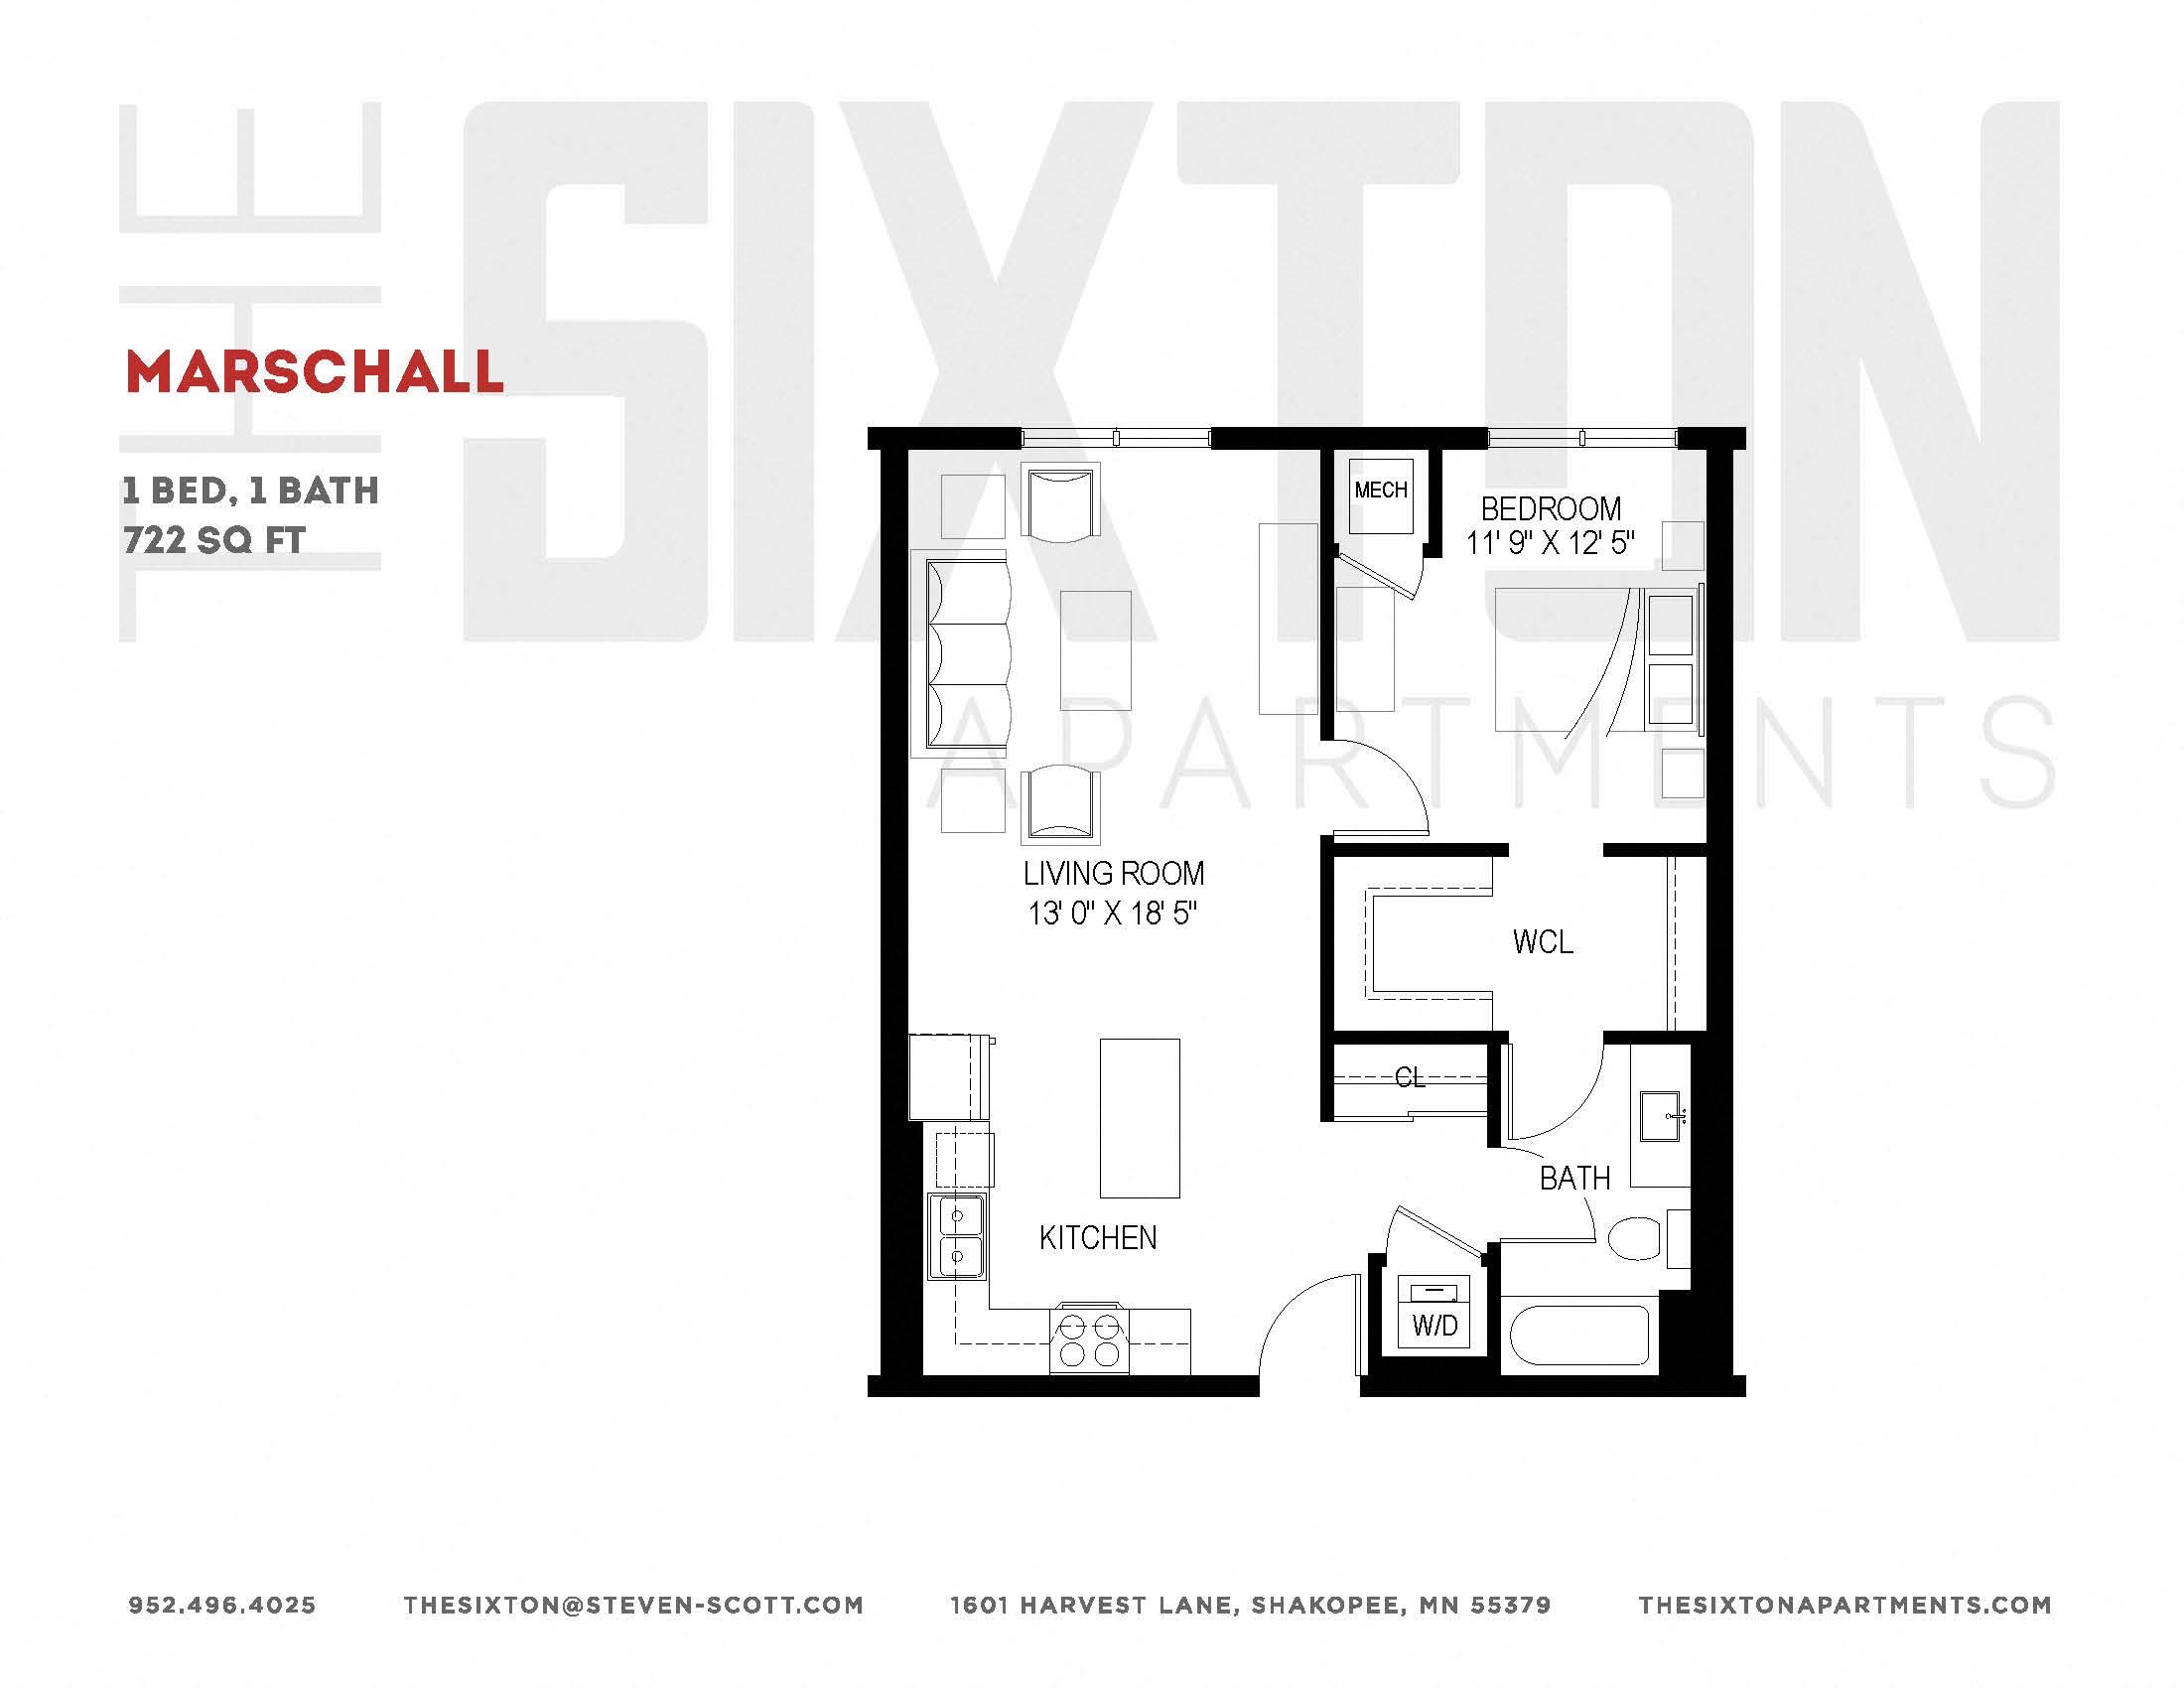 Studio, 1, 2 & 3 Bedroom Apartments in Shakopee, MN | The Sixton